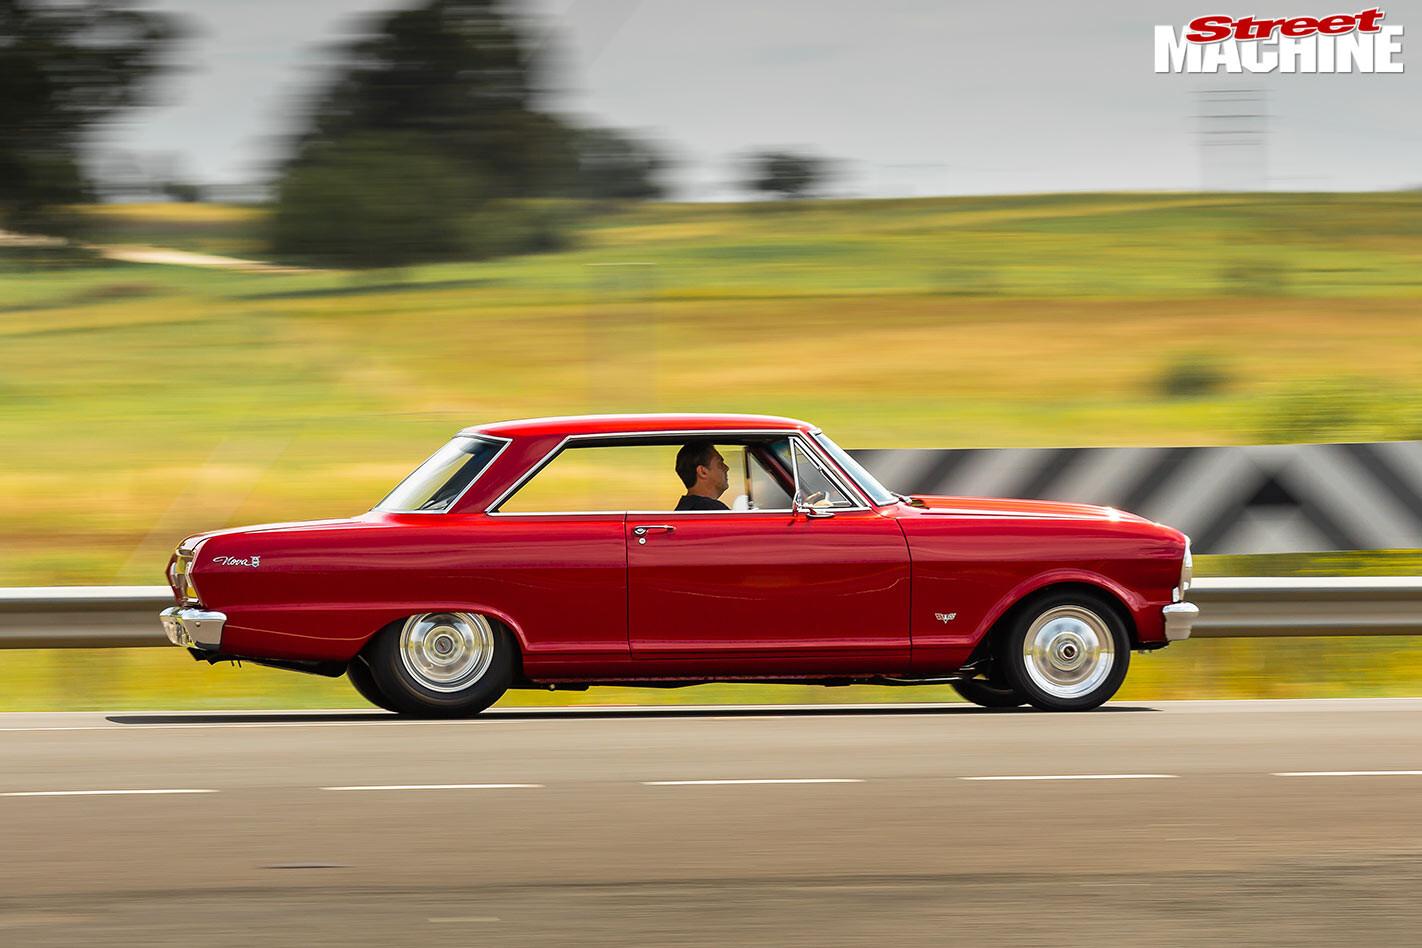 Chevy Nova onroad